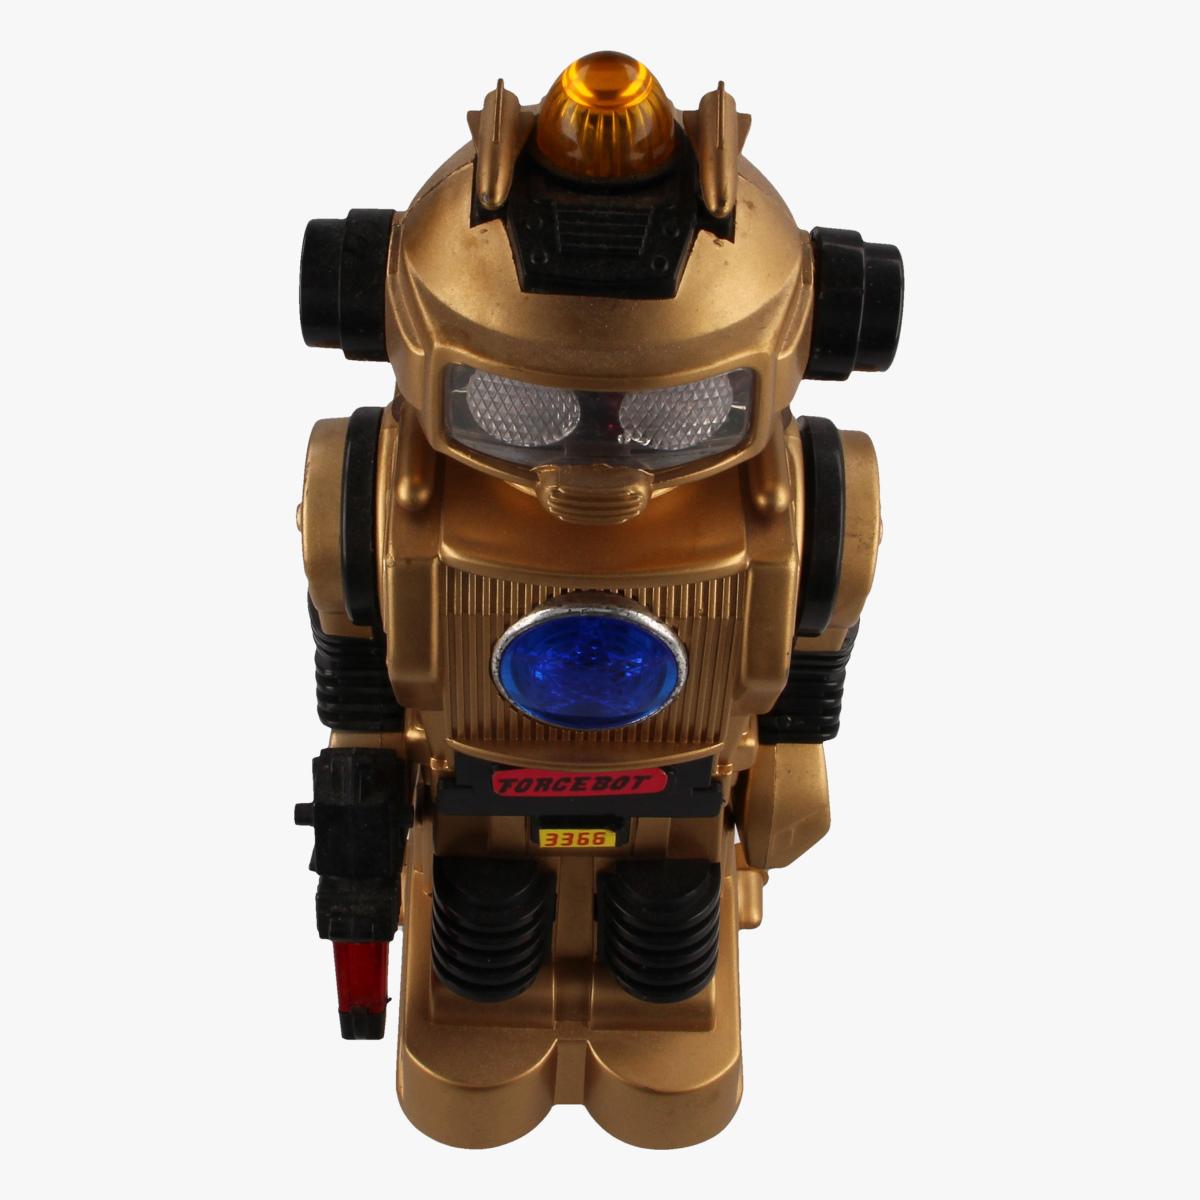 Afbeeldingen van Forcebot, Botoy; nr 3366, goudkleur